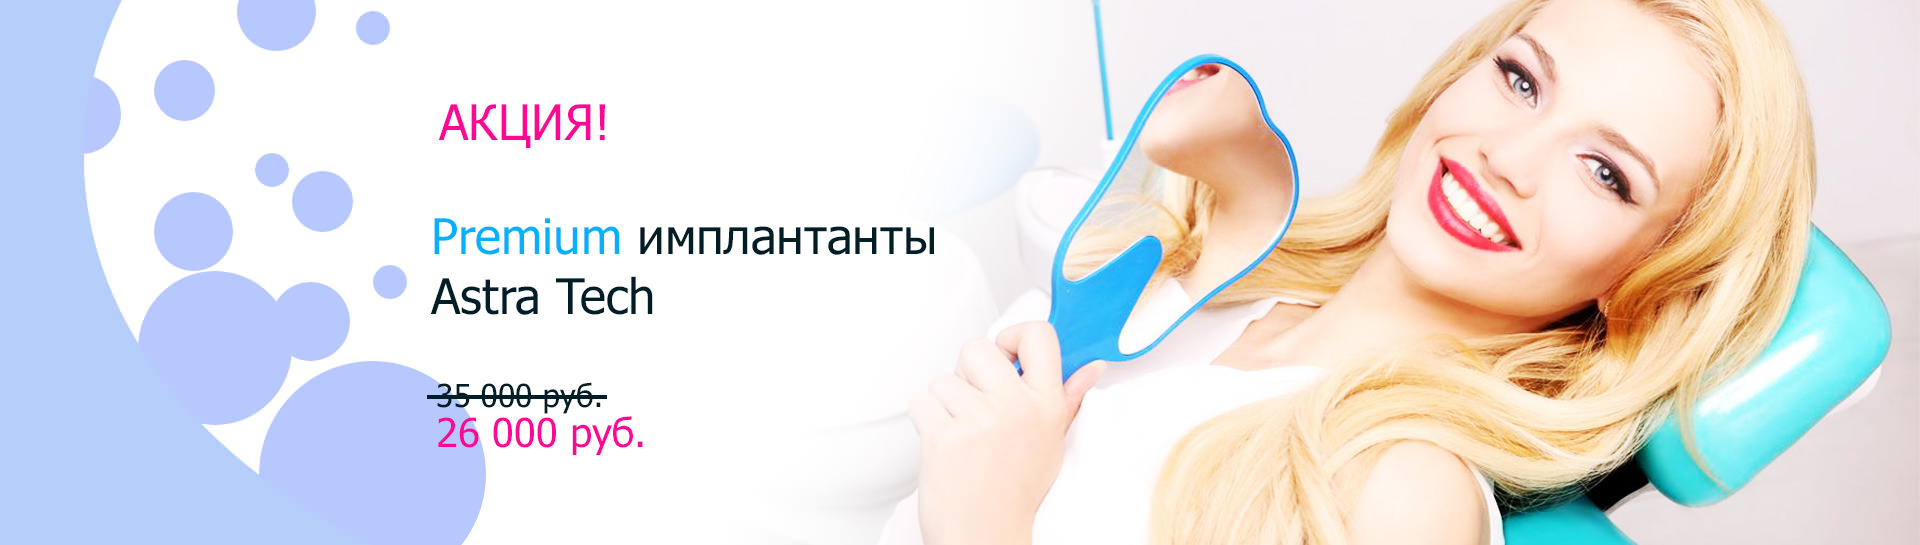 https://denta-maryino.ru/wp-content/uploads/astra-tech.jpg 1x, https://denta-maryino.ru/wp-content/cache/thumb/ca/556e0104be2feca_1320x545.jpg 1320w